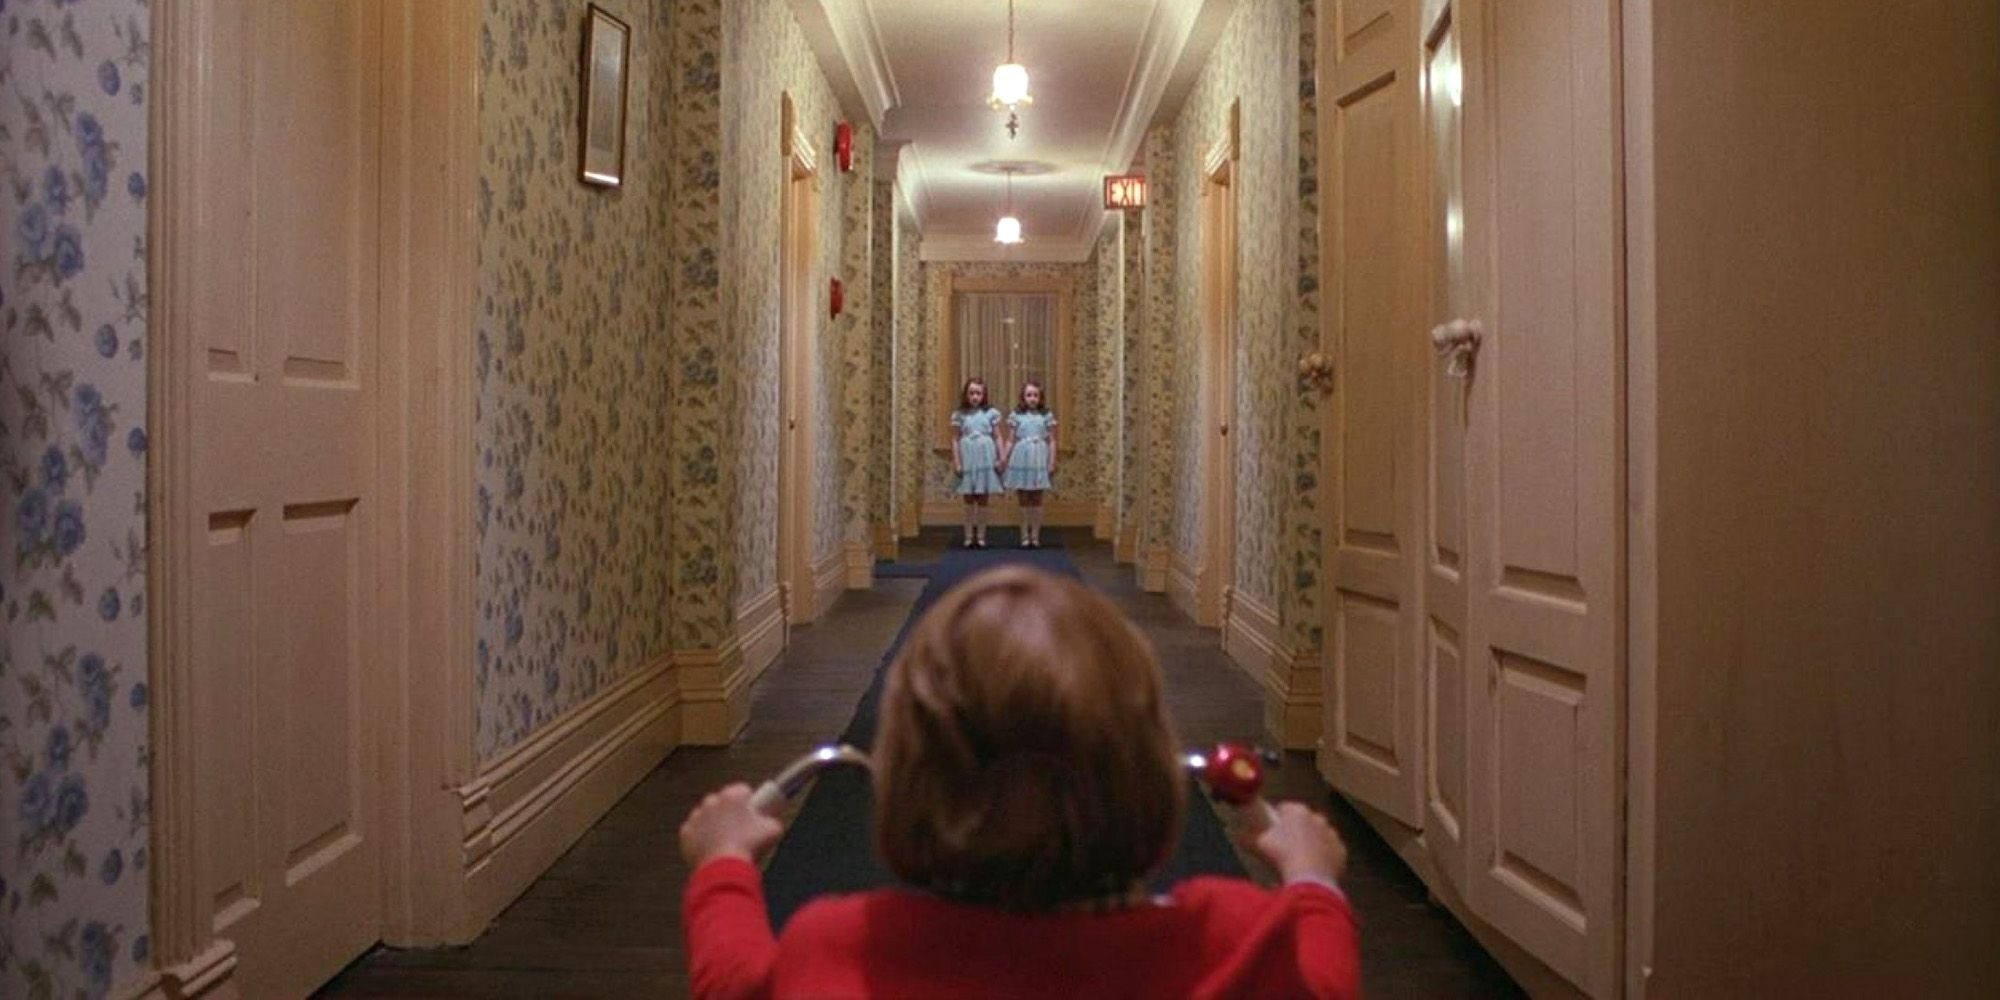 28 Best Halloween Movies on Netflix - Scary Netflix Movies to ...